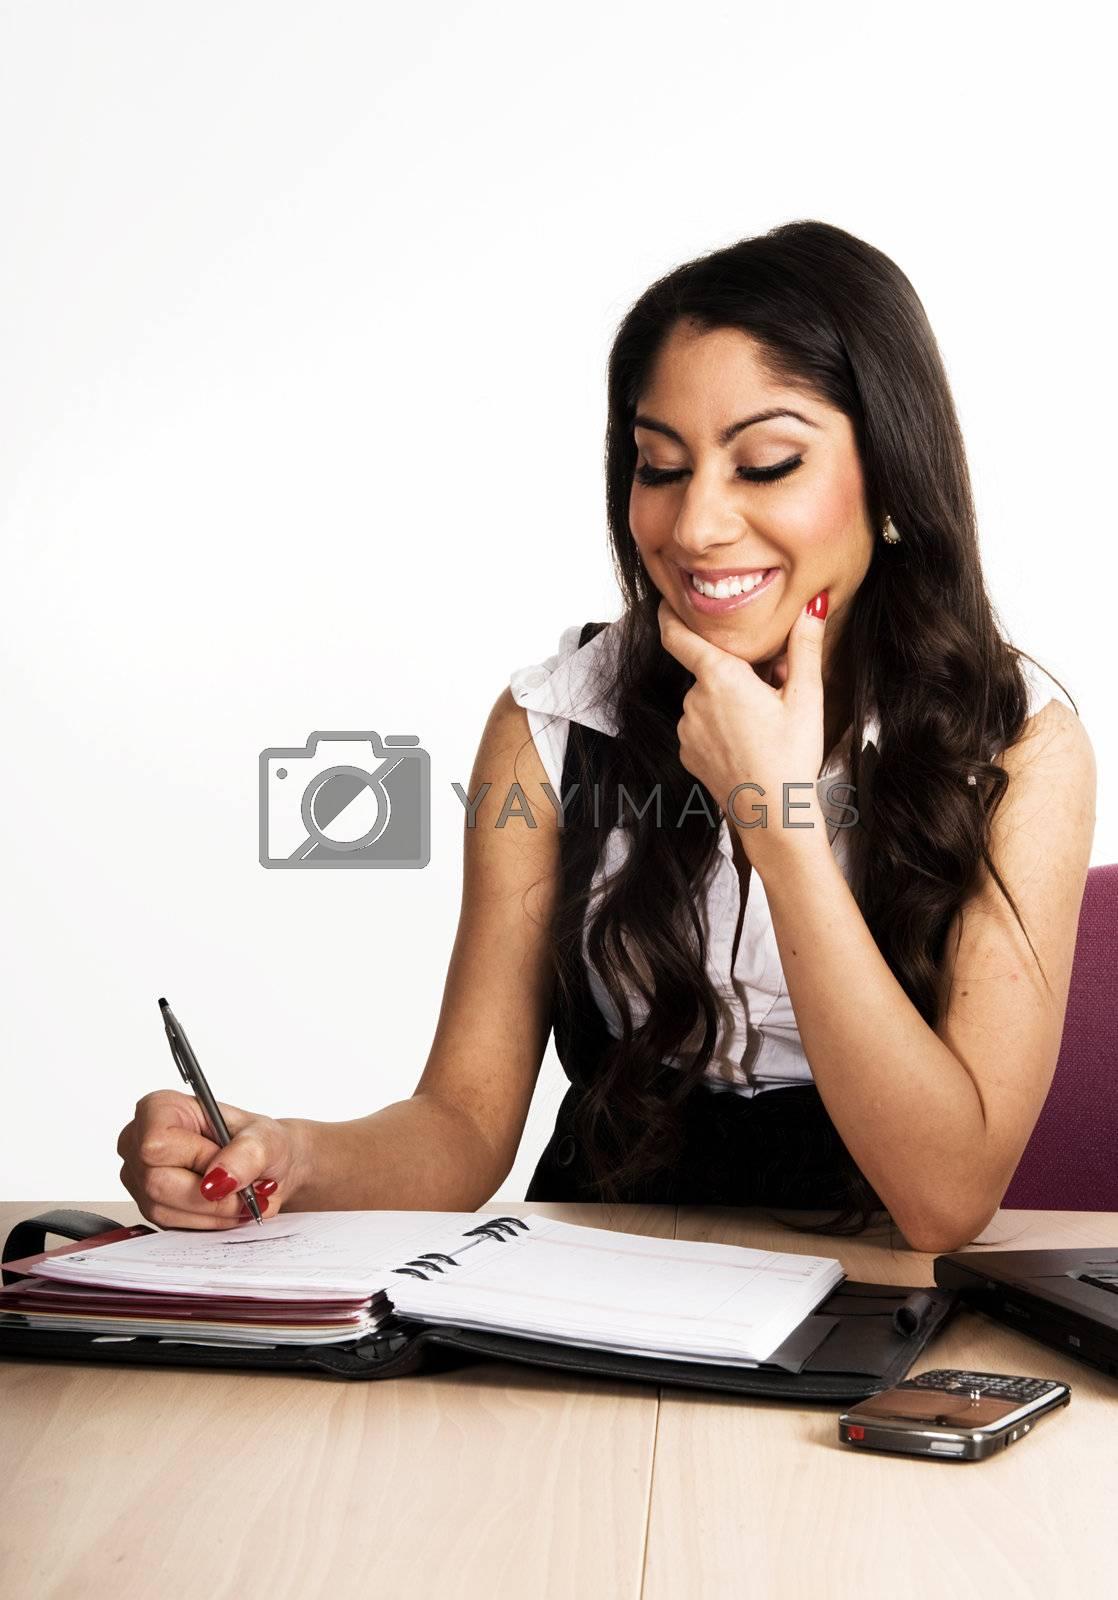 Business woman working on her calendar